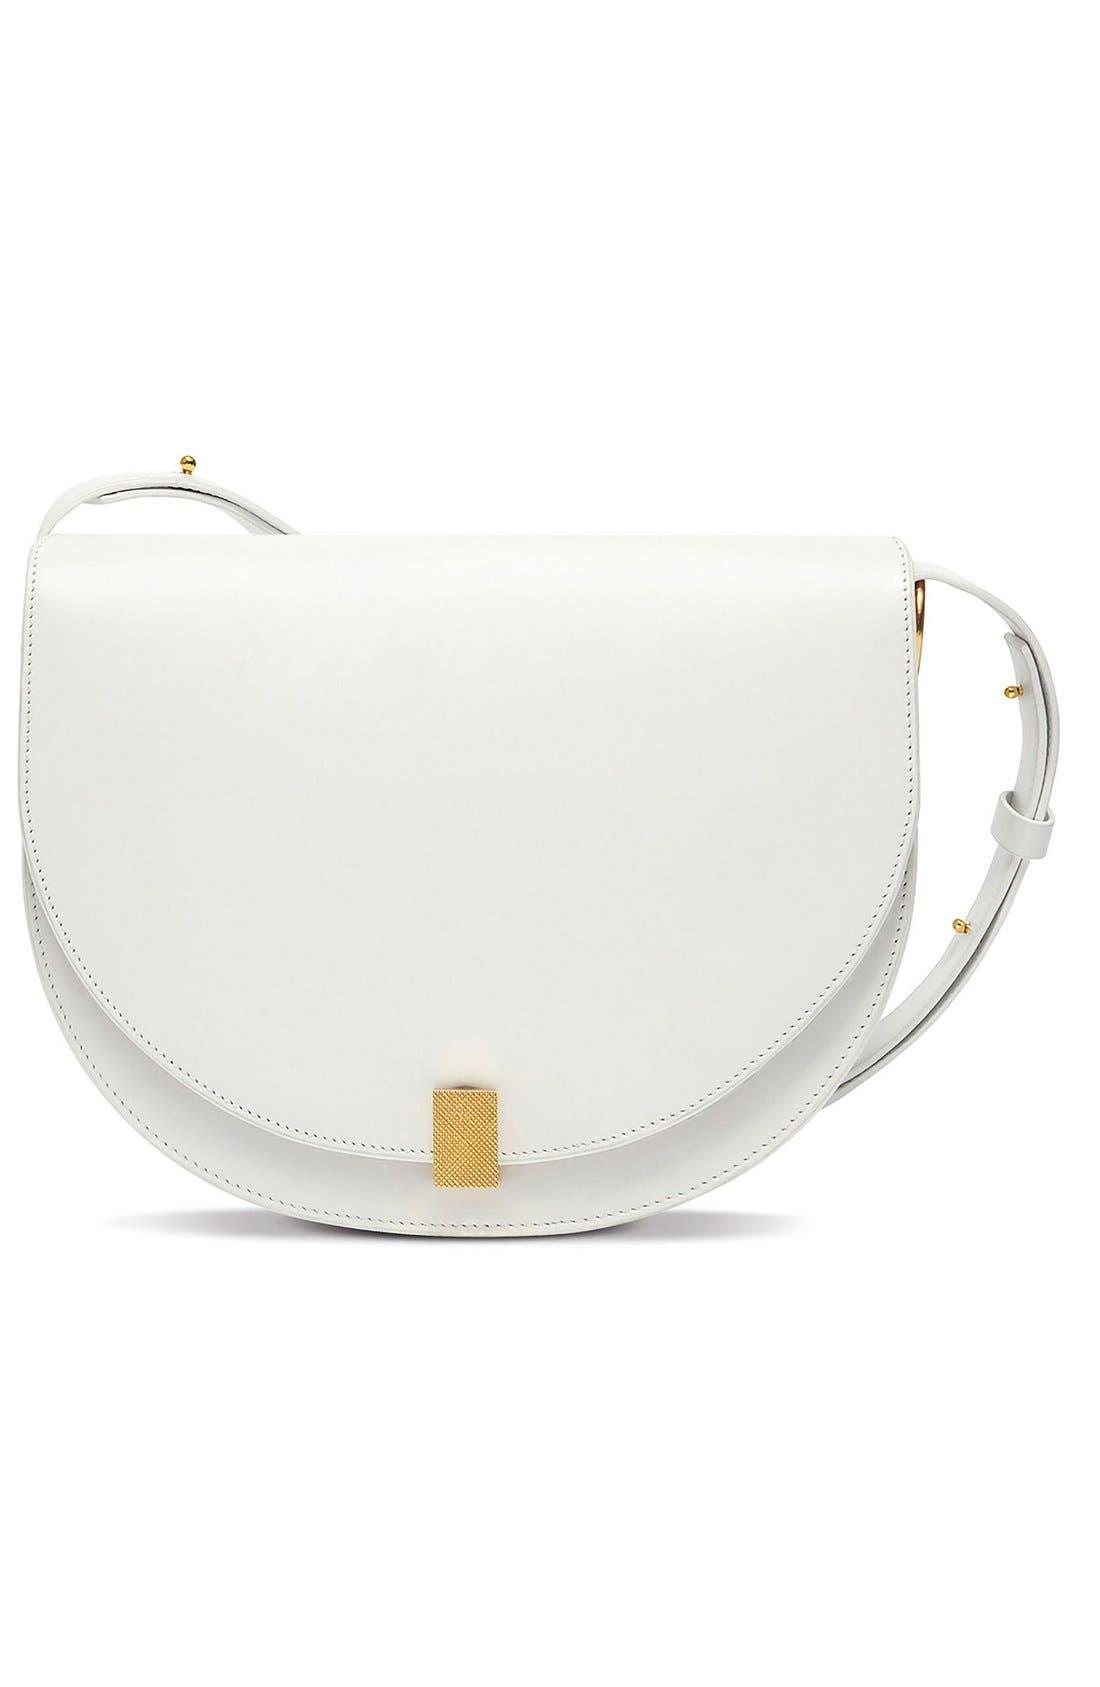 Half Moon Box Shoulder Bag,                         Main,                         color, WHITE